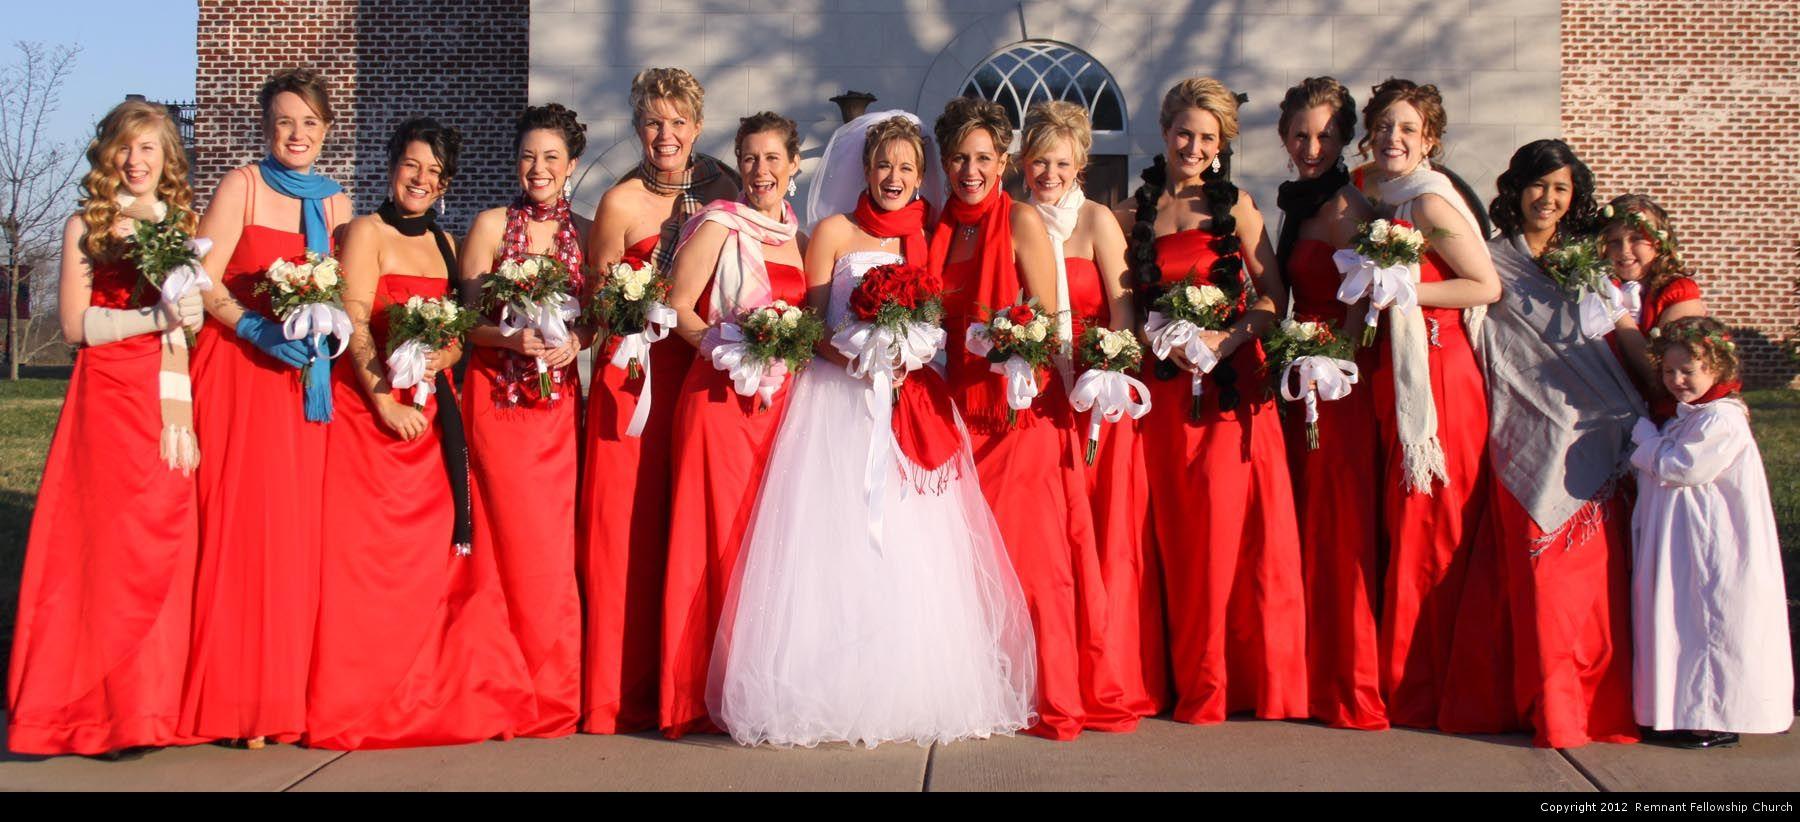 Red remnant fellowship weddings winter wedding red bridesmaid dresses ormazaelam covenant wedding ombrellifo Gallery